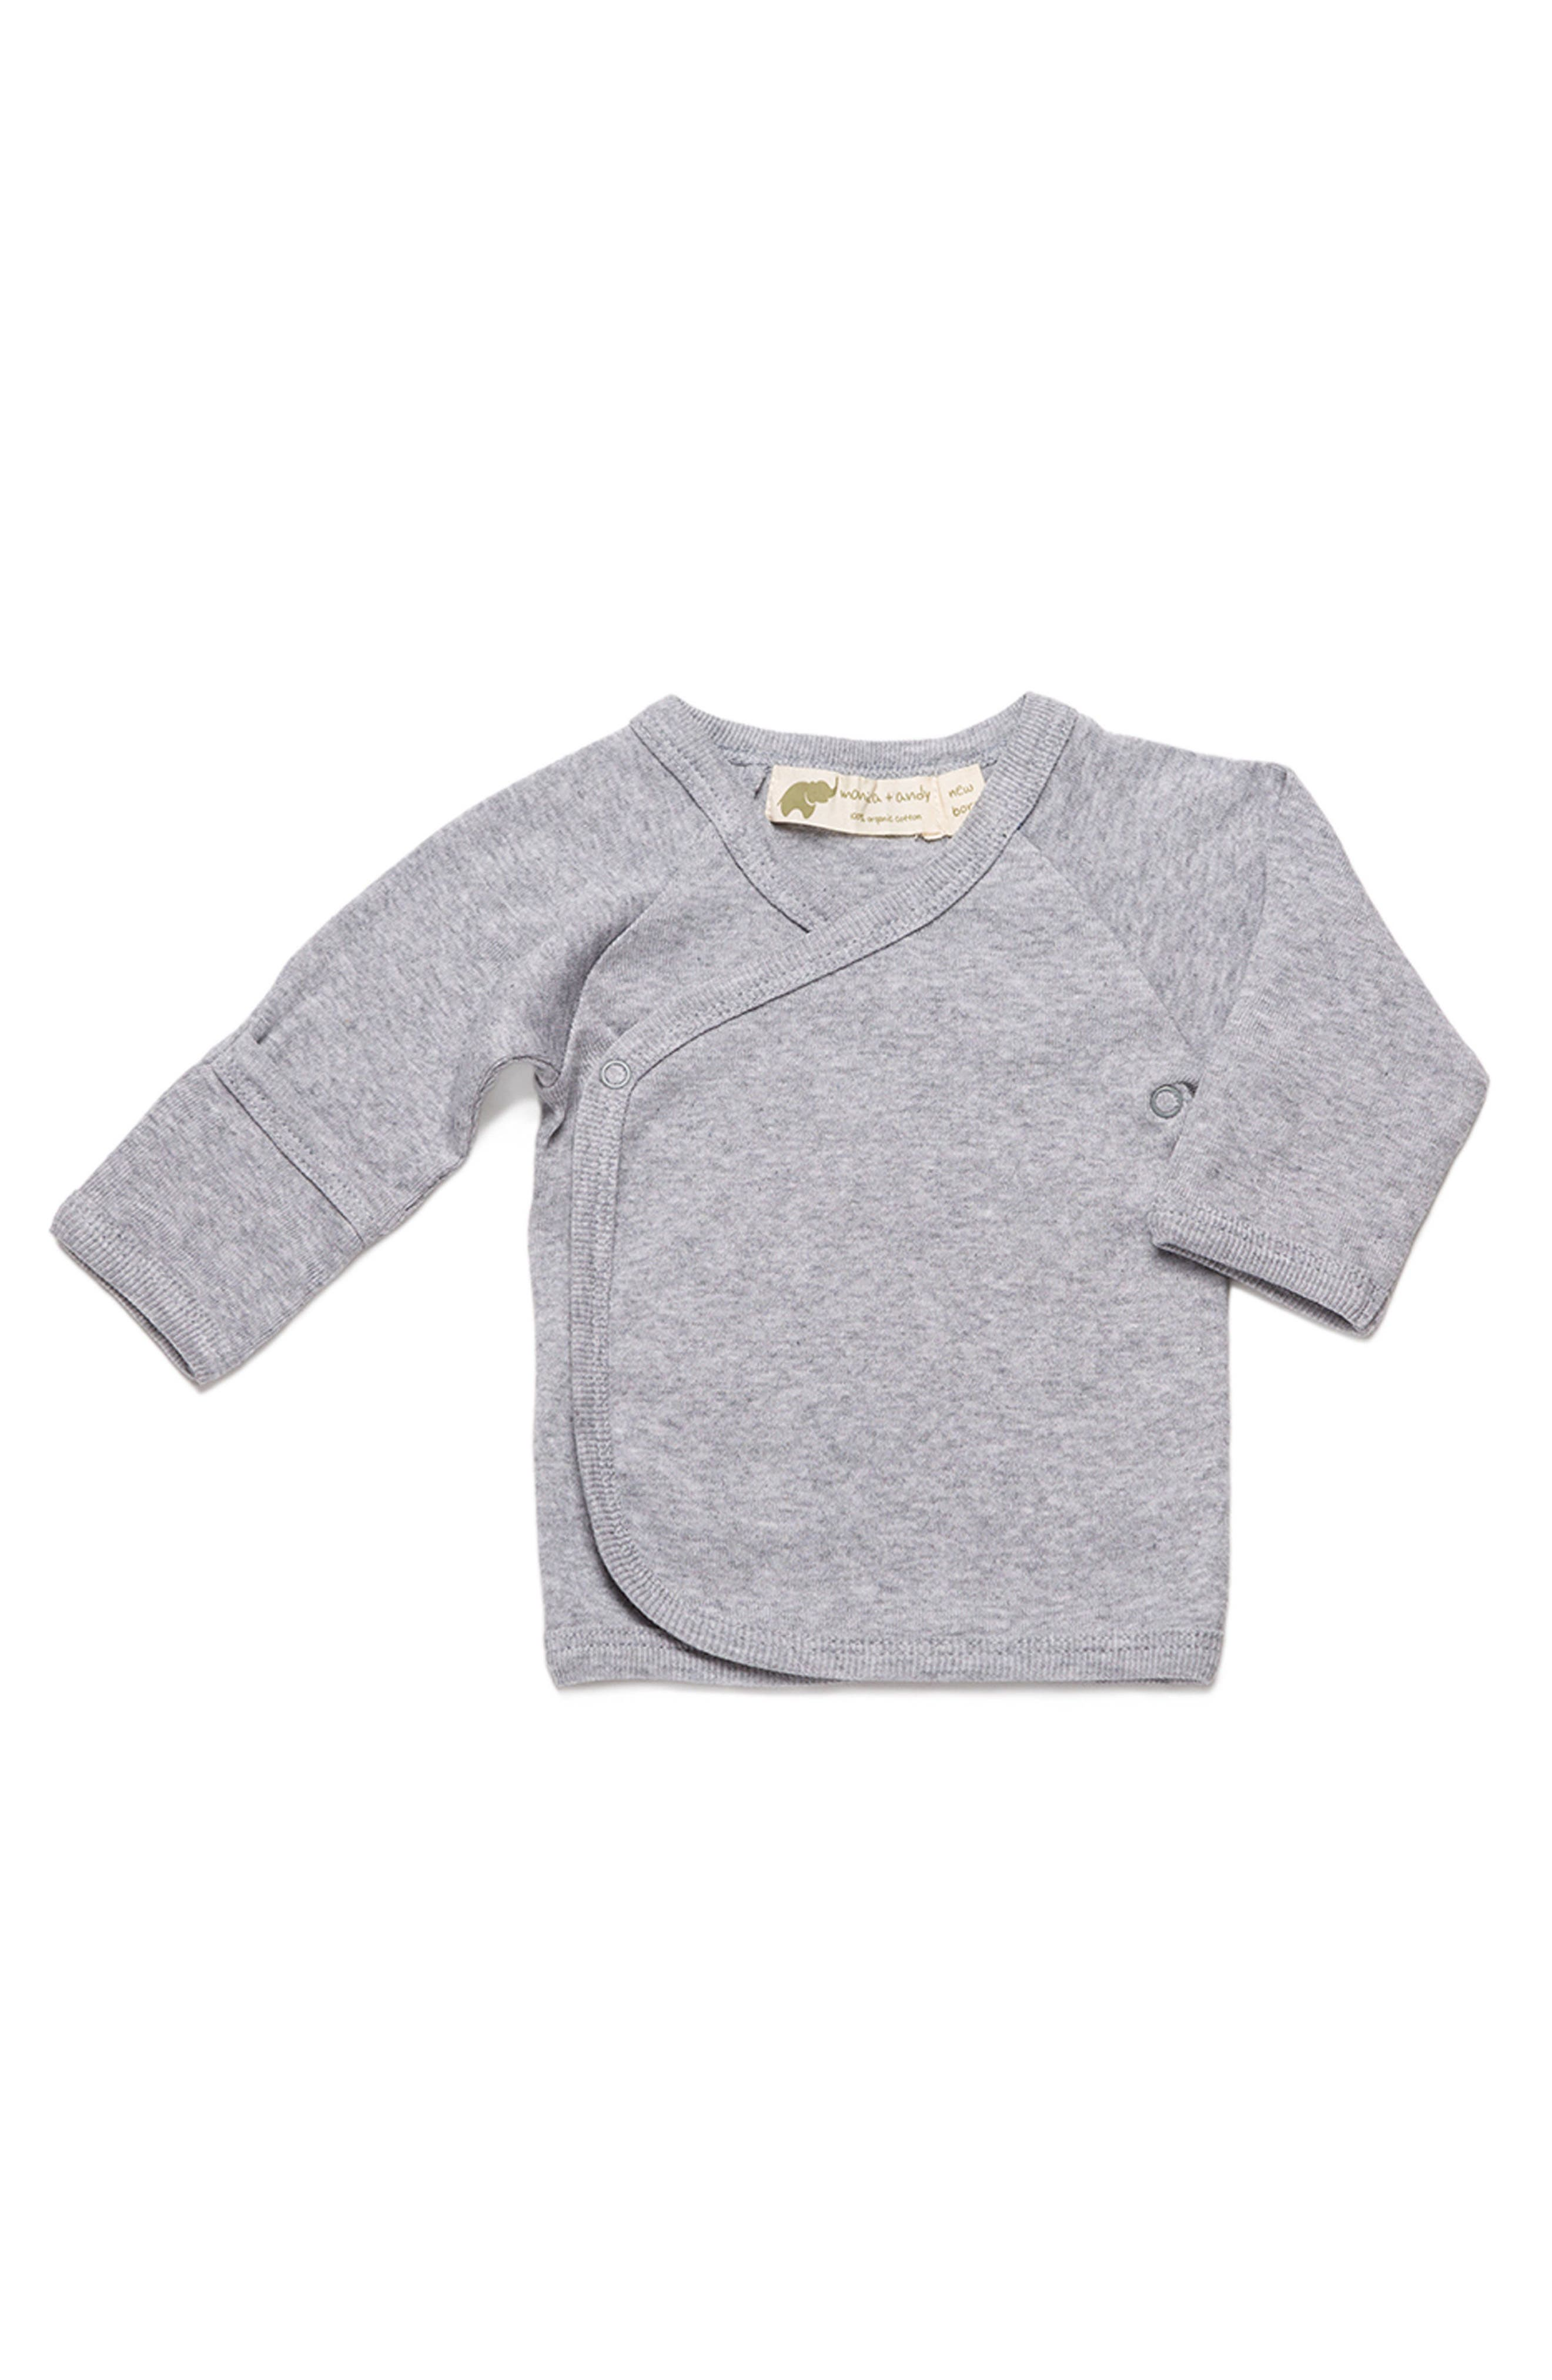 Hello Baby Organic Cotton Top,                         Main,                         color, 020